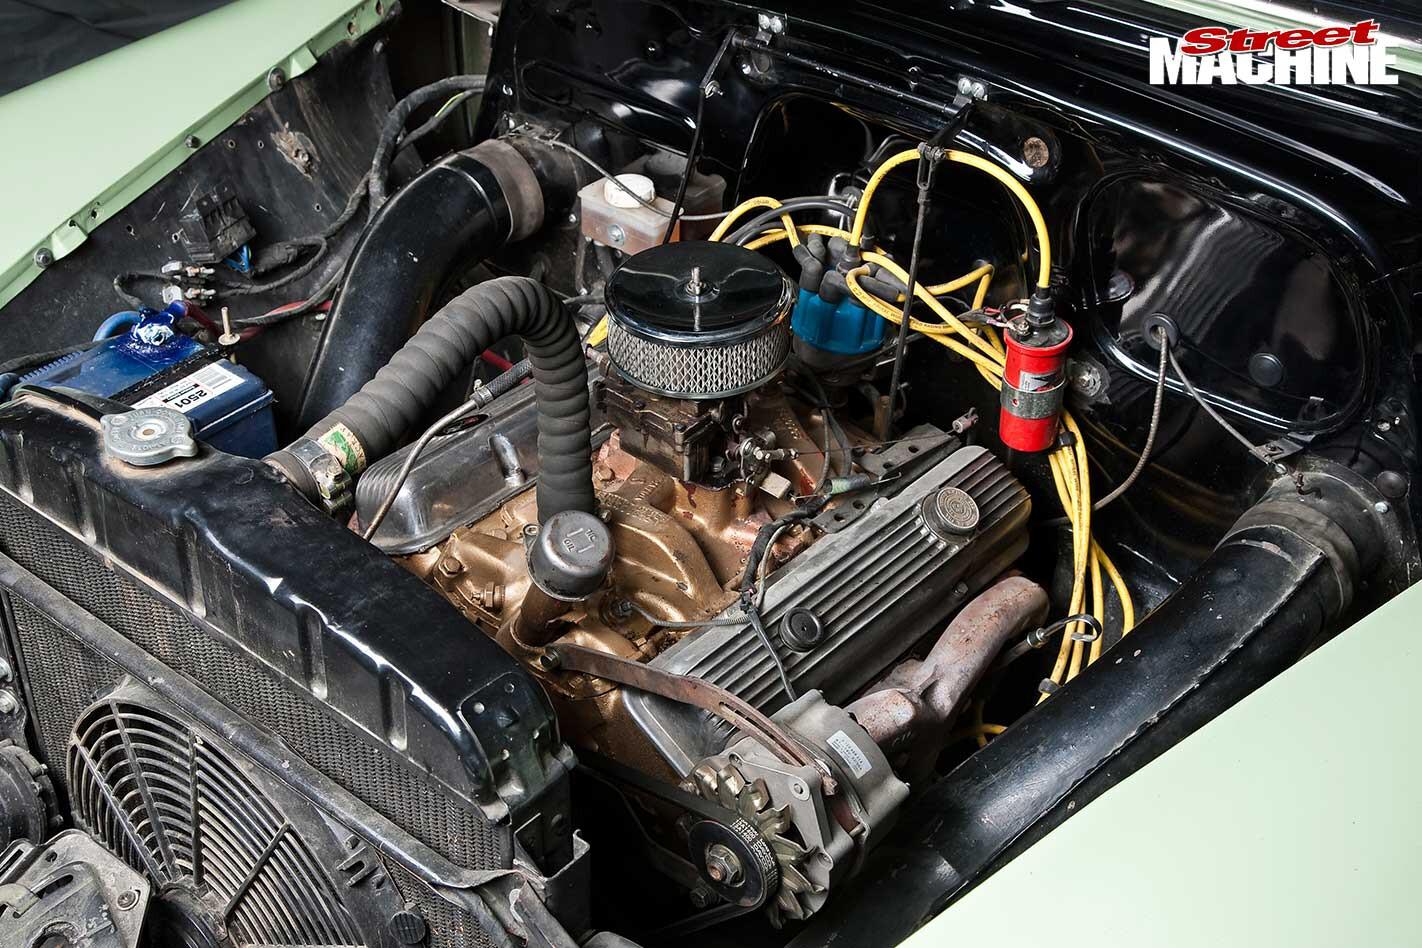 Chev sedan engine bay